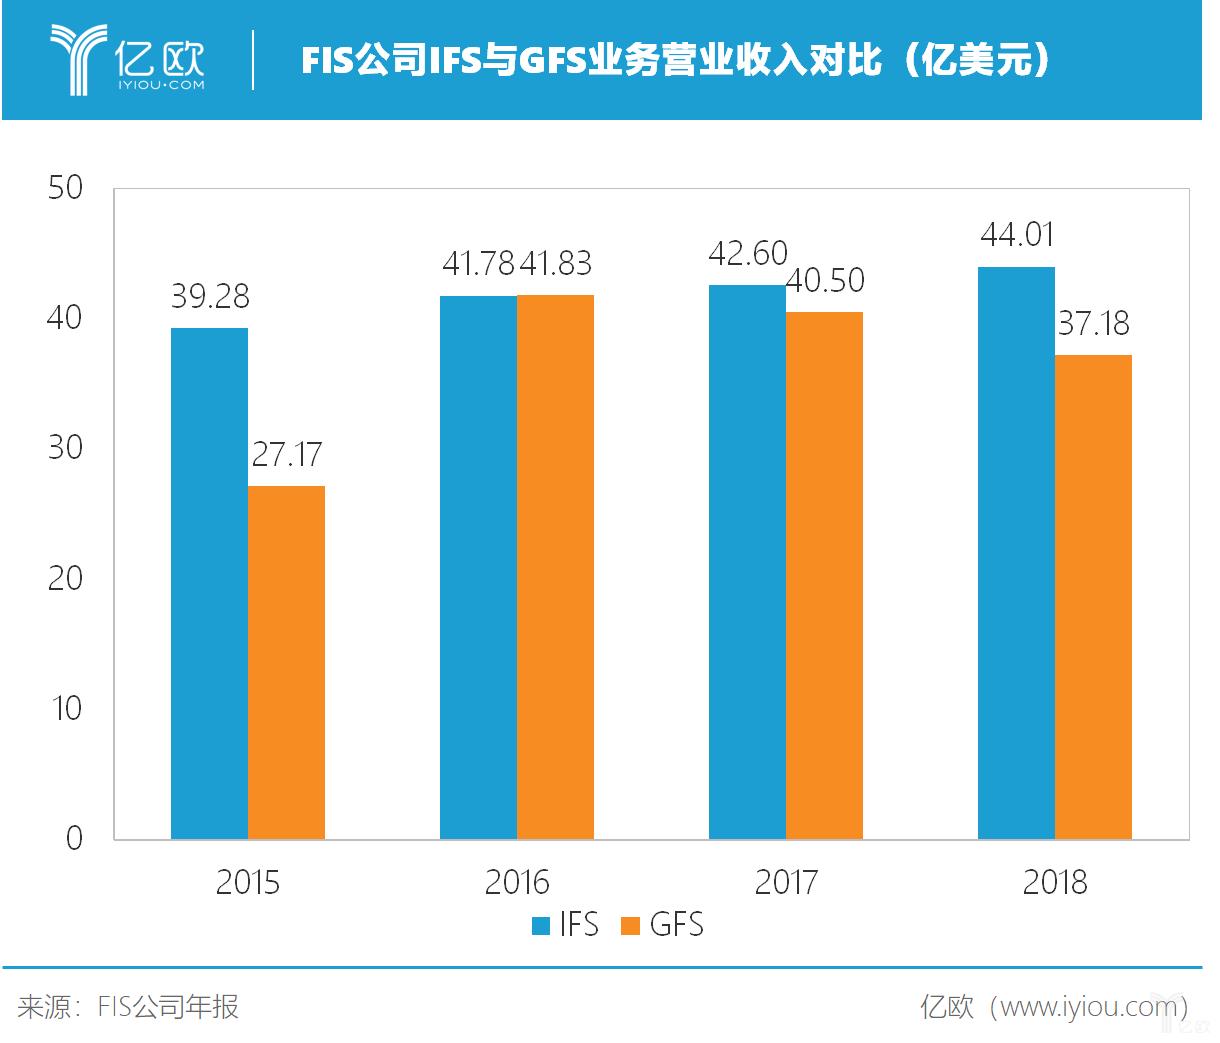 FIS公司IFS与GFS业务营业收入对比(亿美元)